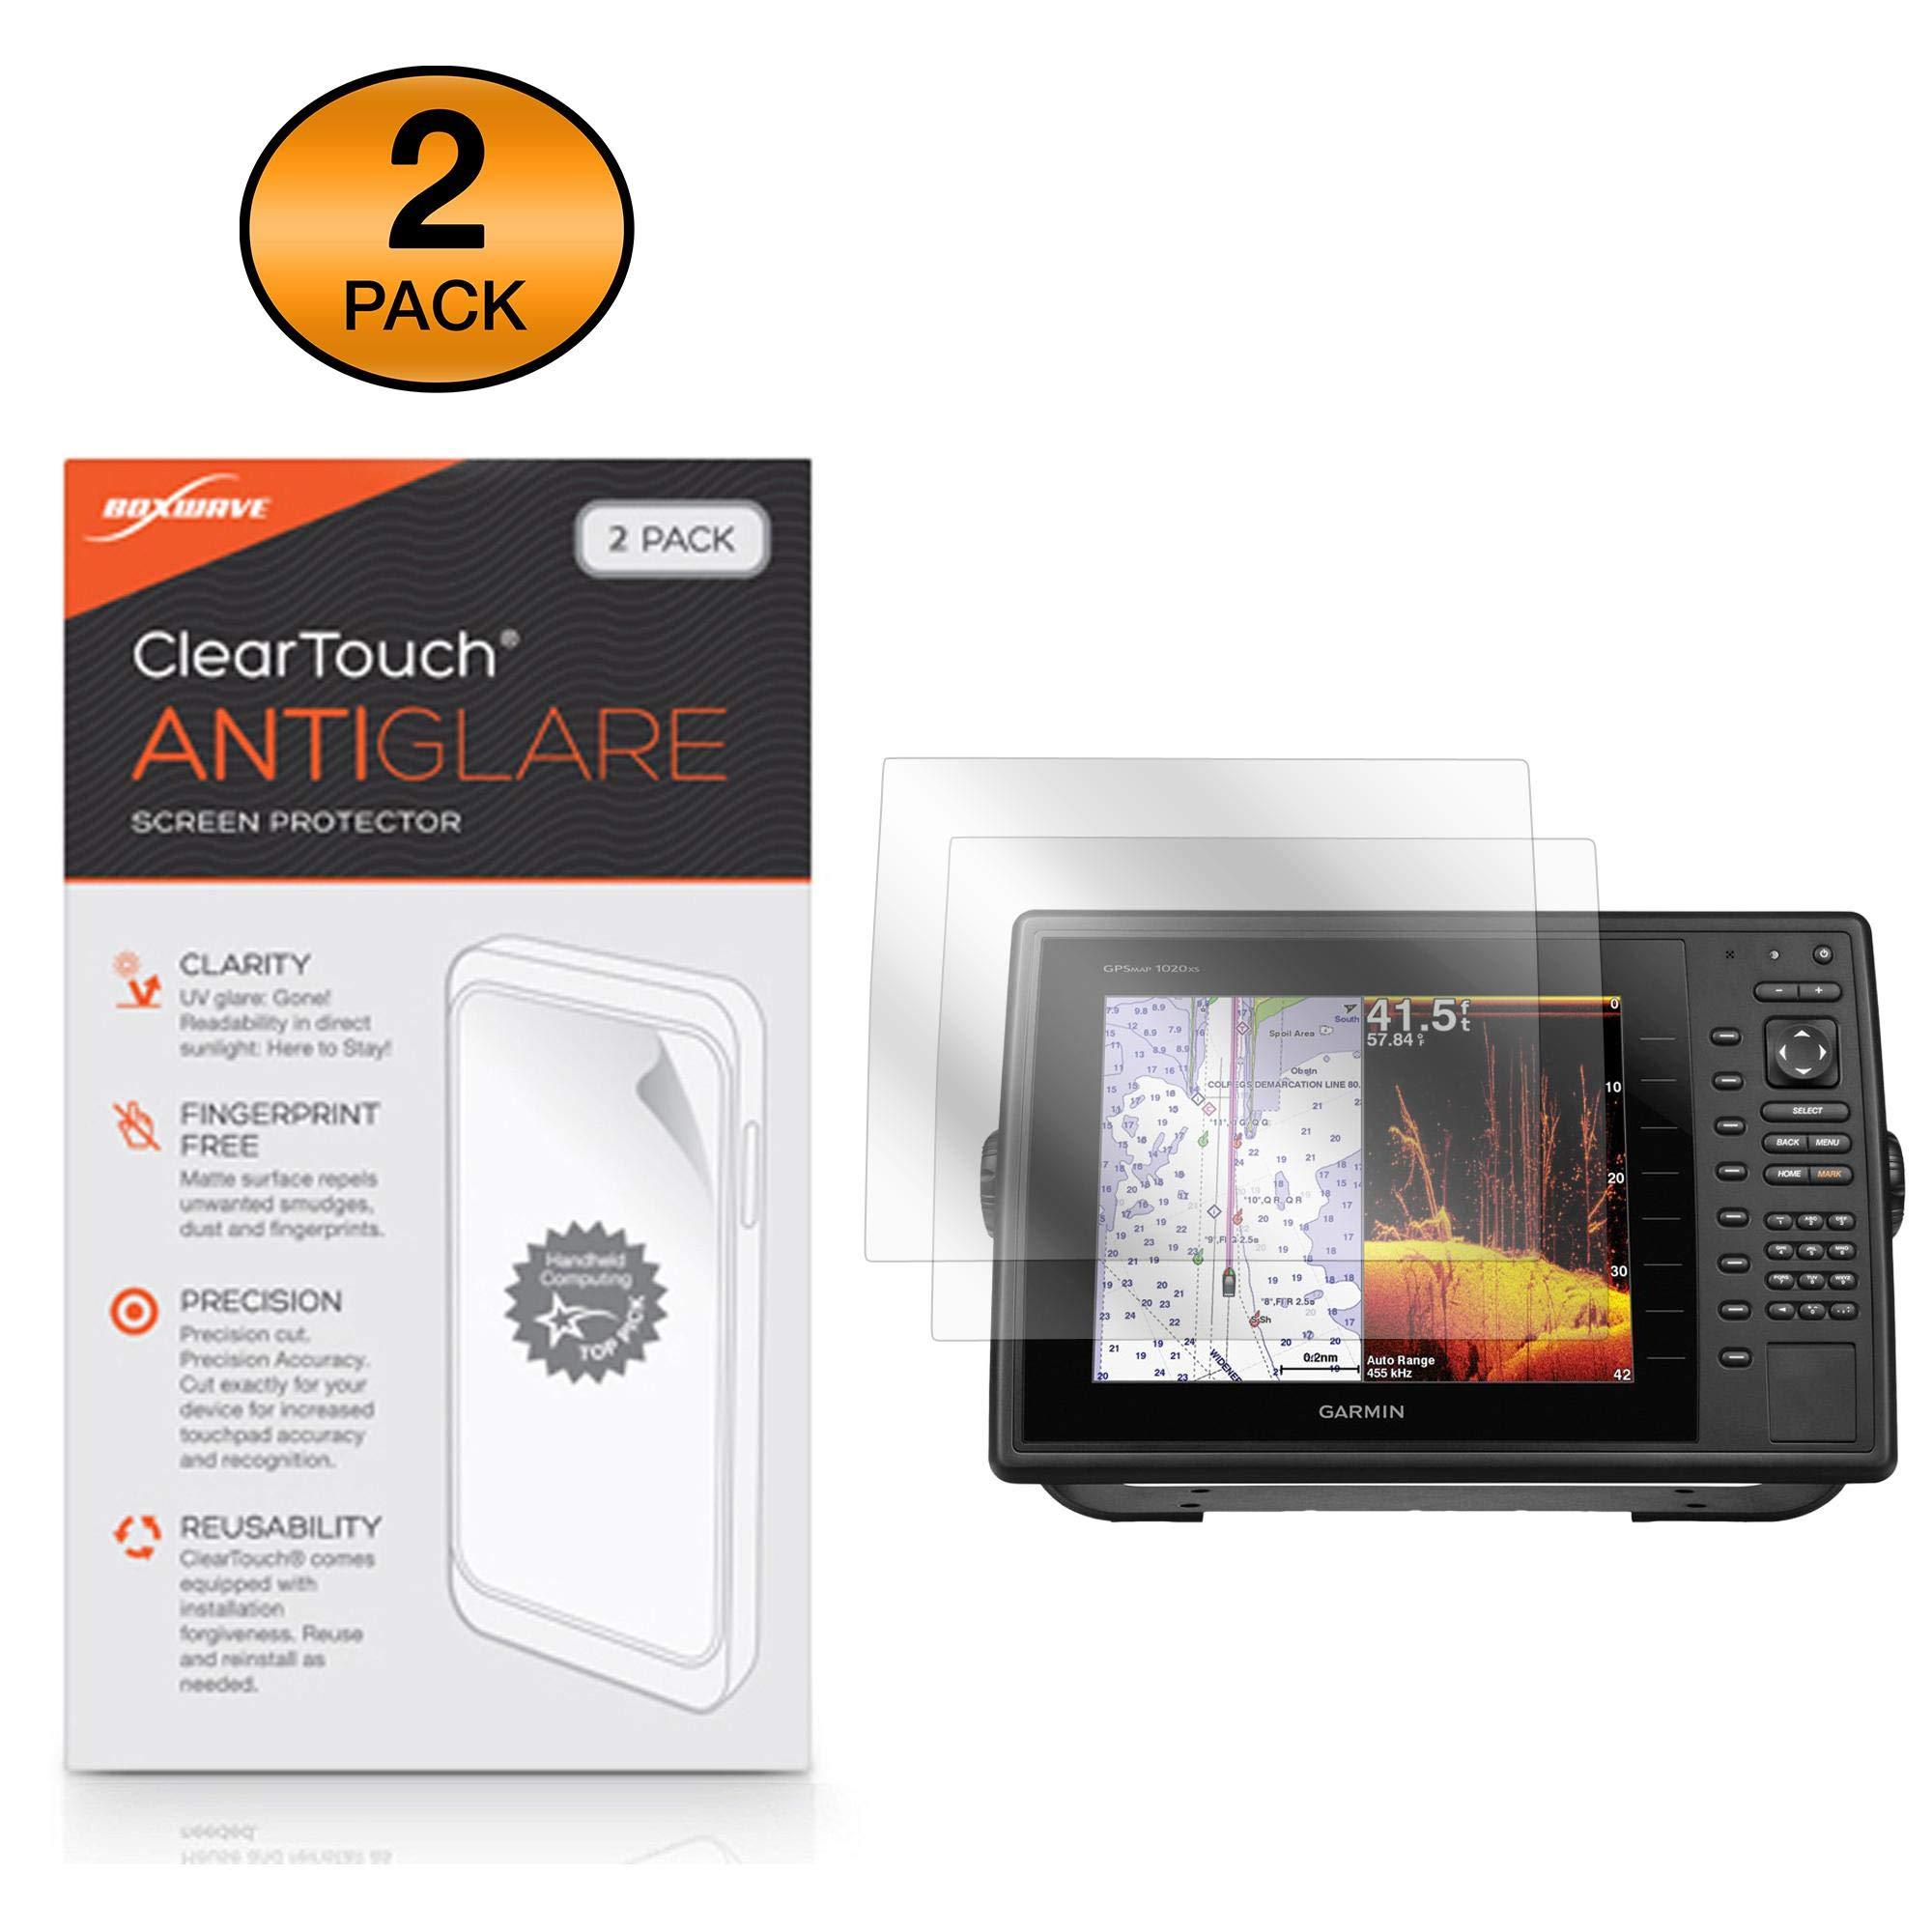 Garmin GPSMAP 1040xs Screen Protector, BoxWave [ClearTouch Anti-Glare (2-Pack)] Anti-Fingerprint Matte Film Skin for Garmin GPSMAP 1040xs, 1020xs, 1020 by BoxWave